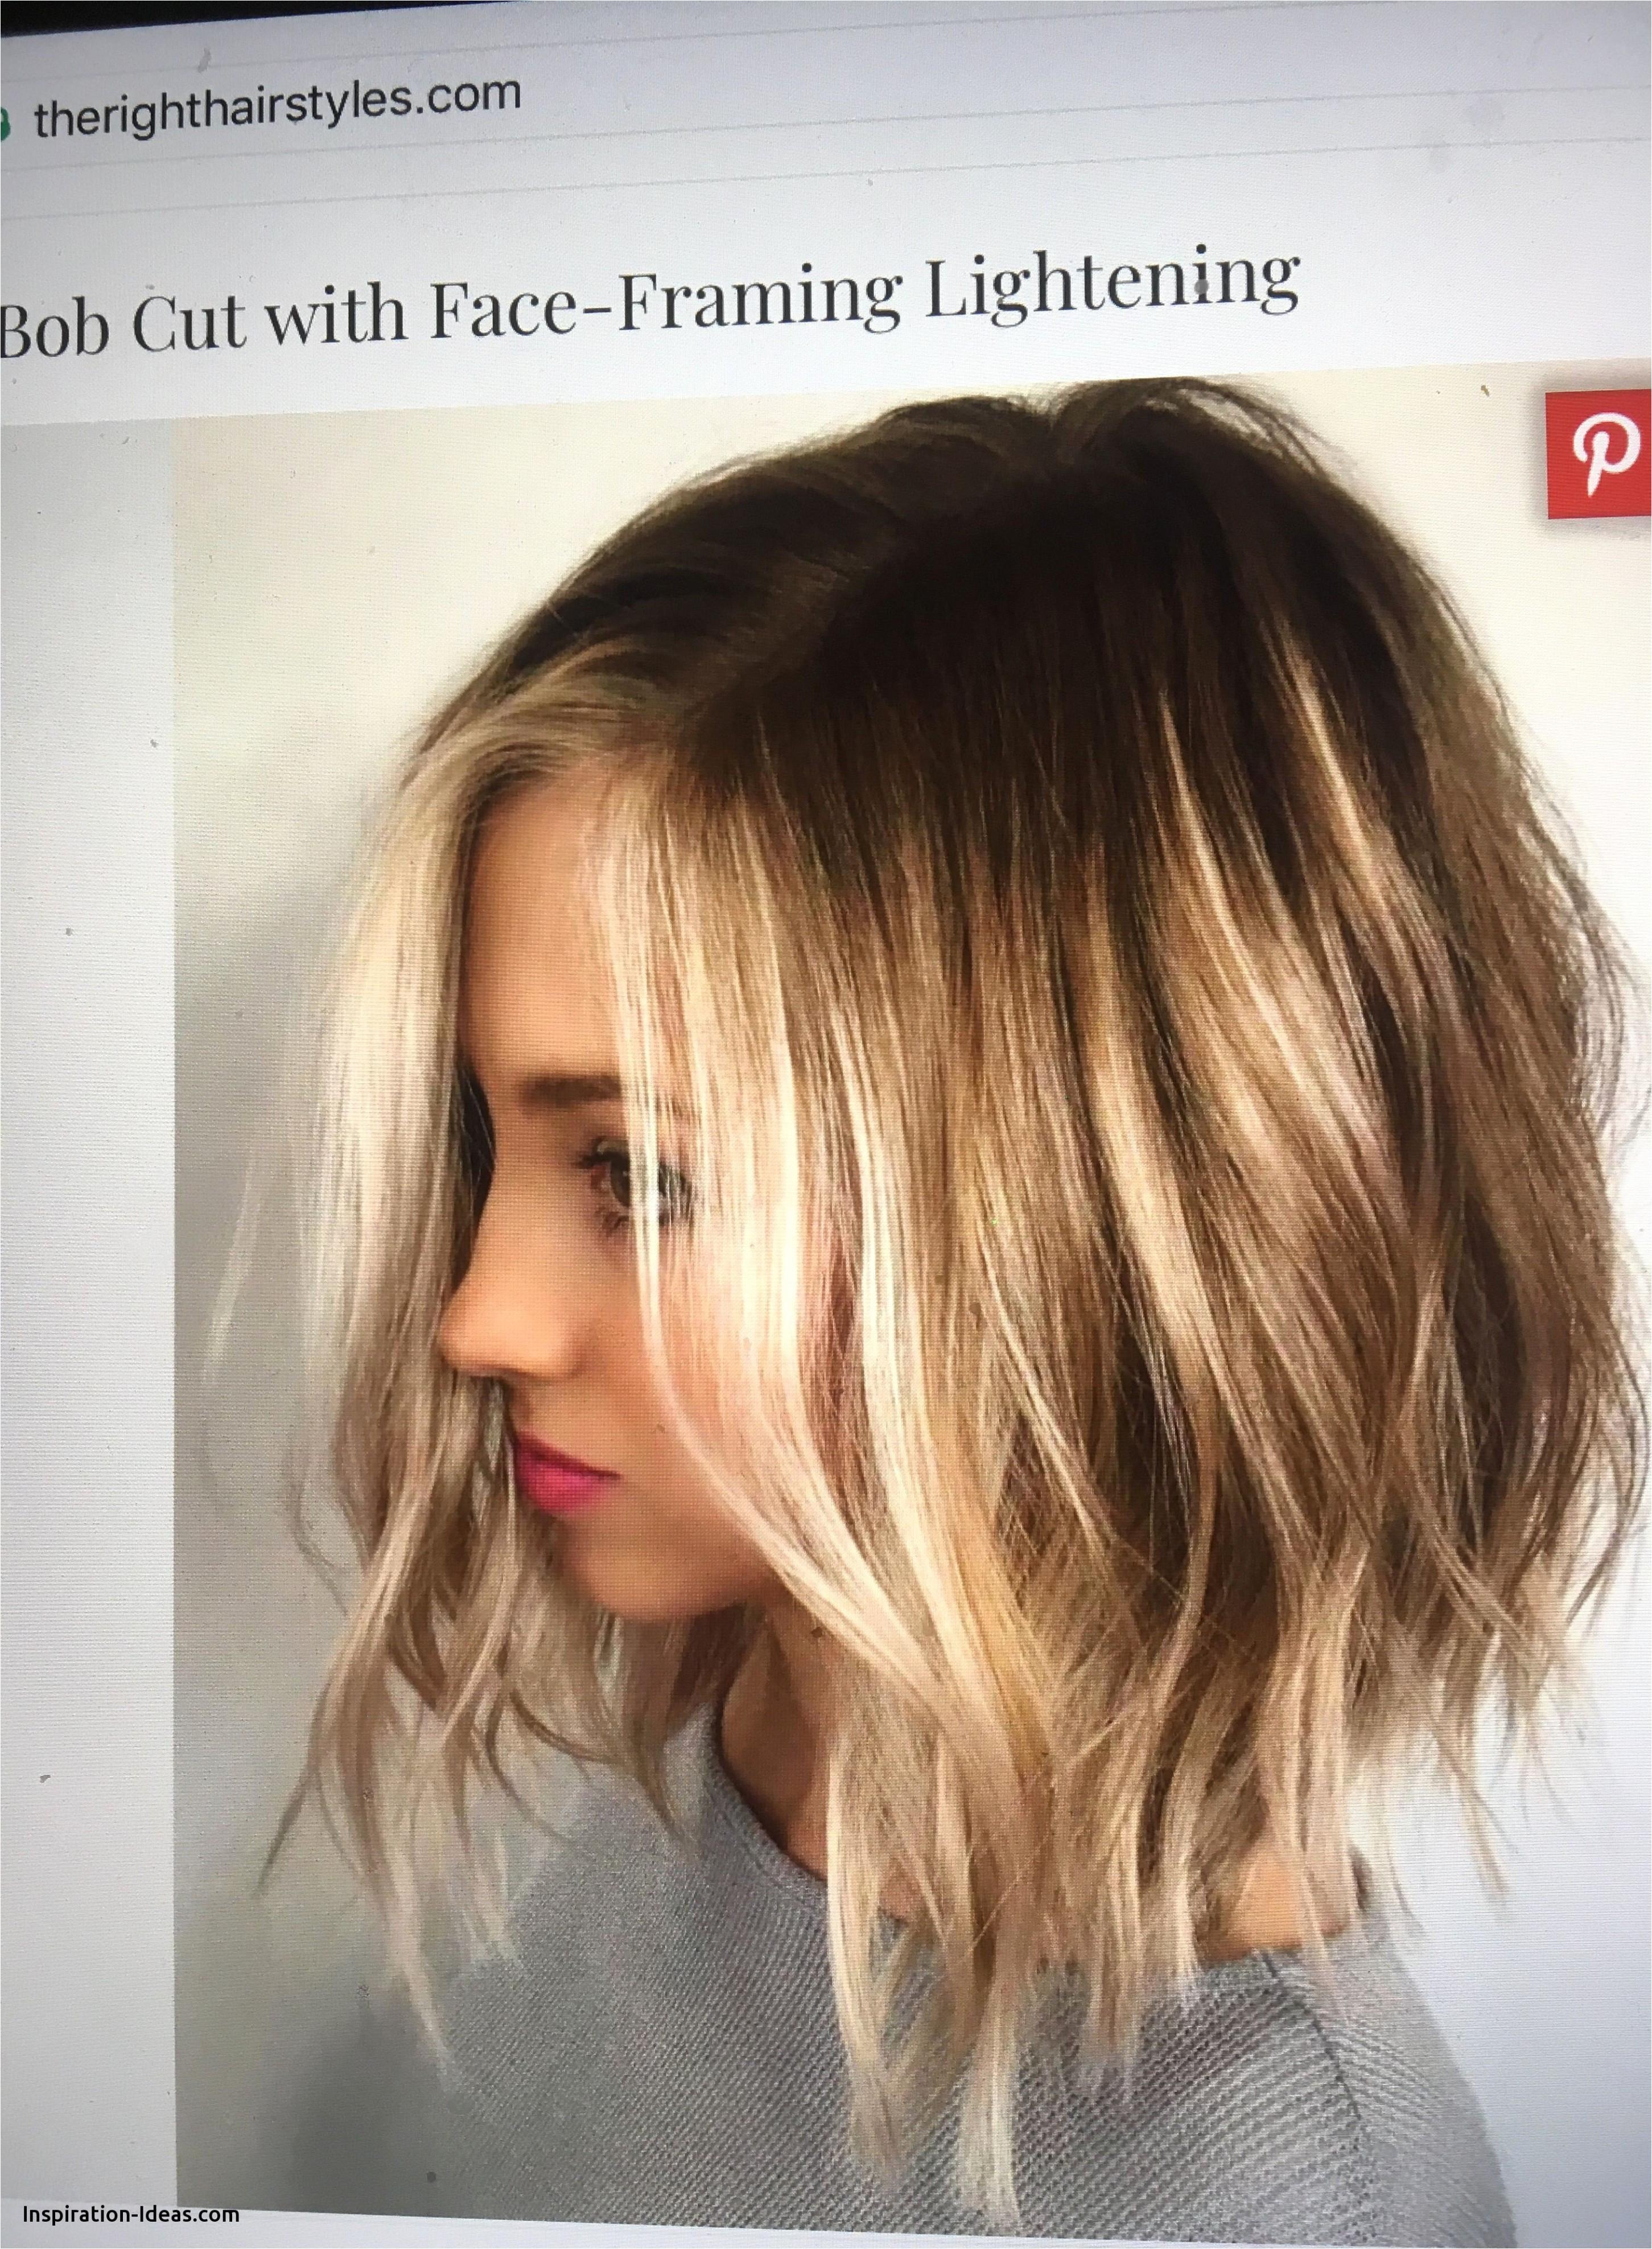 Cute Hairstyles for Girls with Bangs Elegant 20 Fresh Cute Hairstyle Ideas for Medium Length Hair